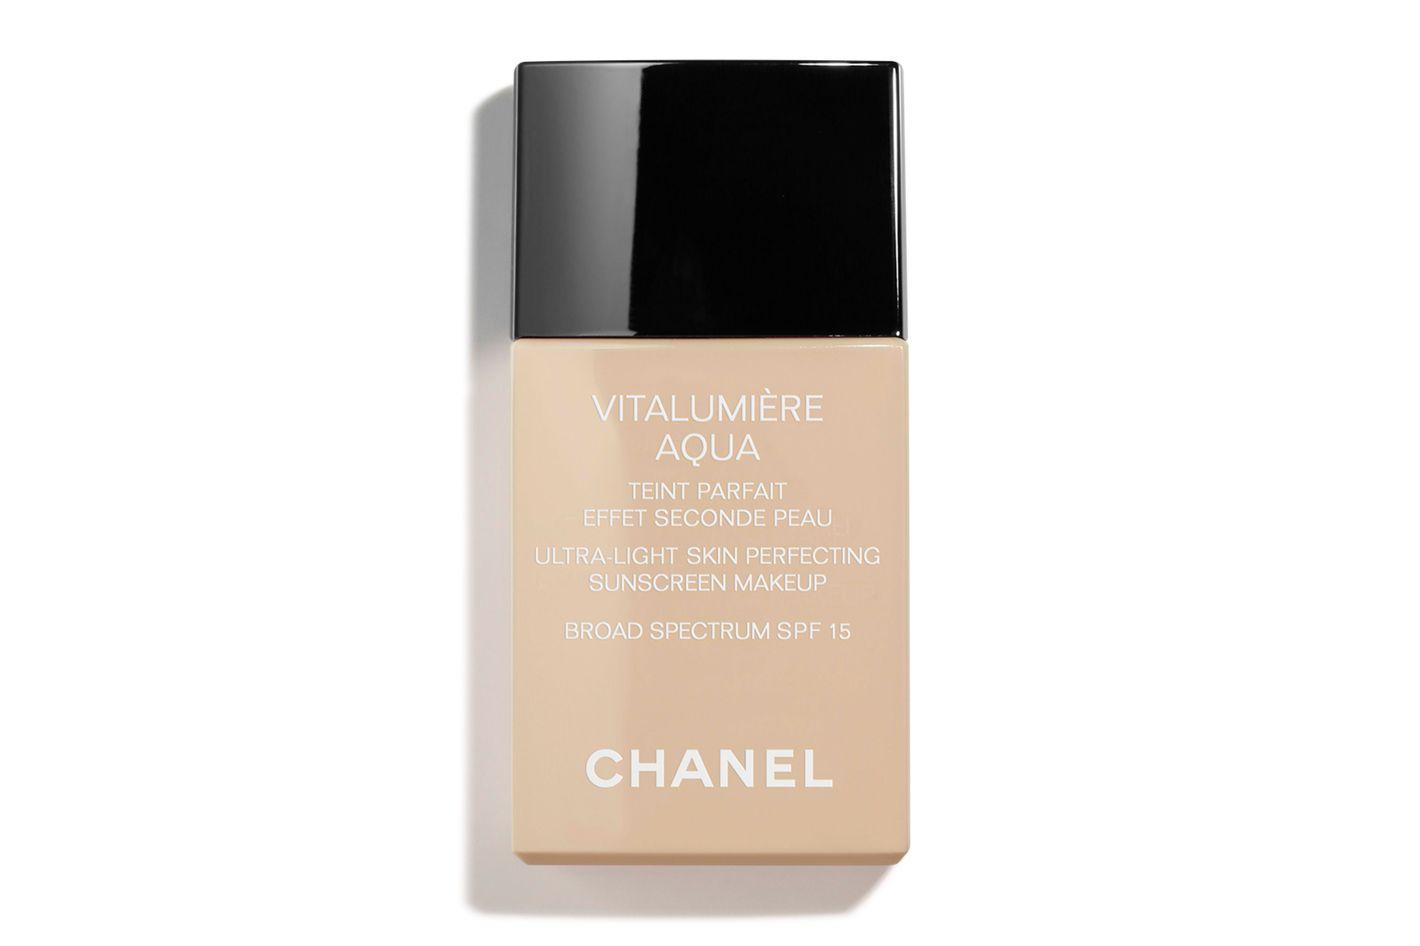 chanel vitalumiere aqua review dry skin